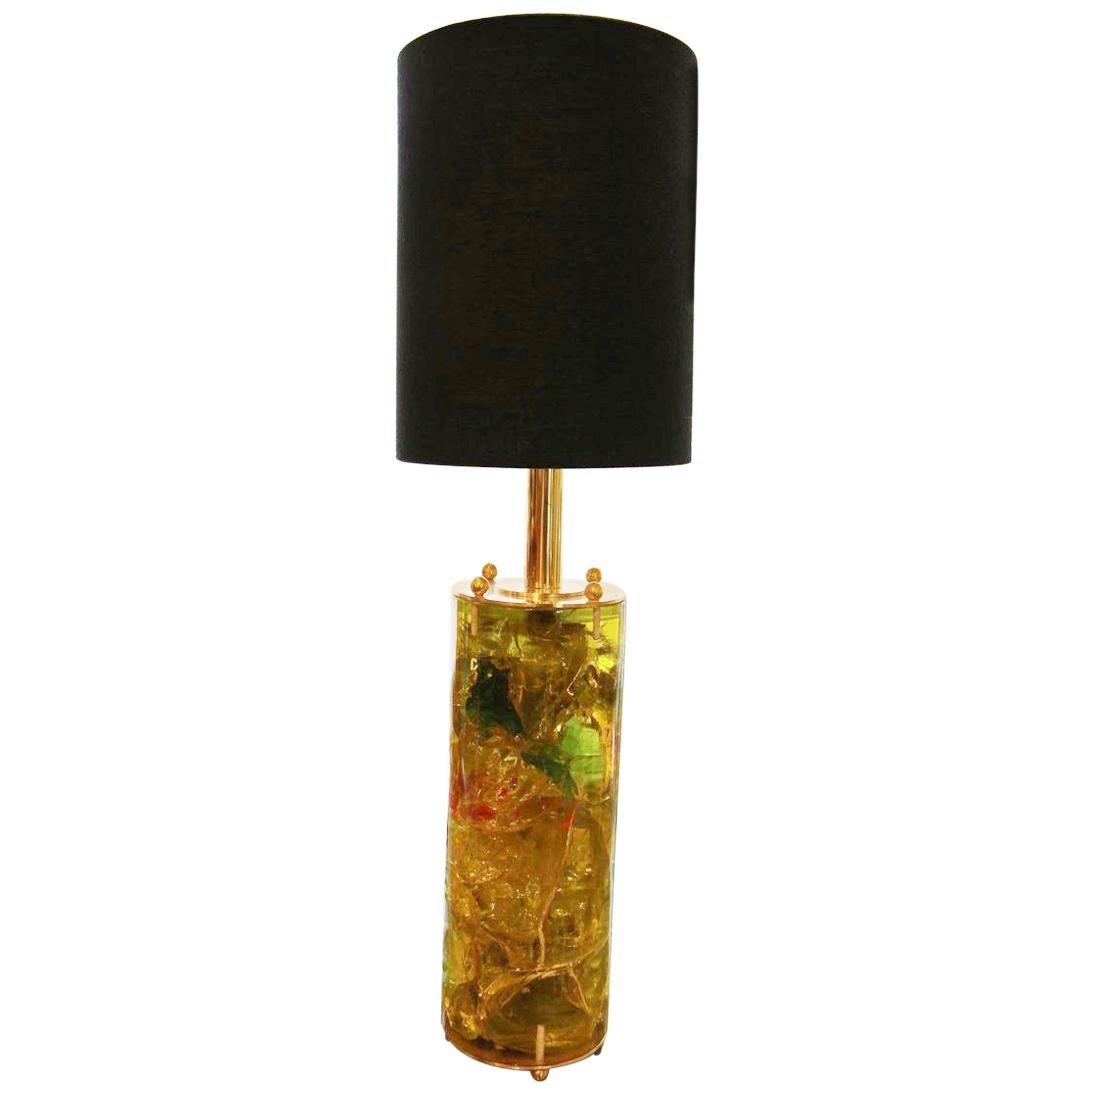 Fractal Resin Table Lamp, Brass Plate,Marie-Claude de Fouquières,Pierrre Giraudo